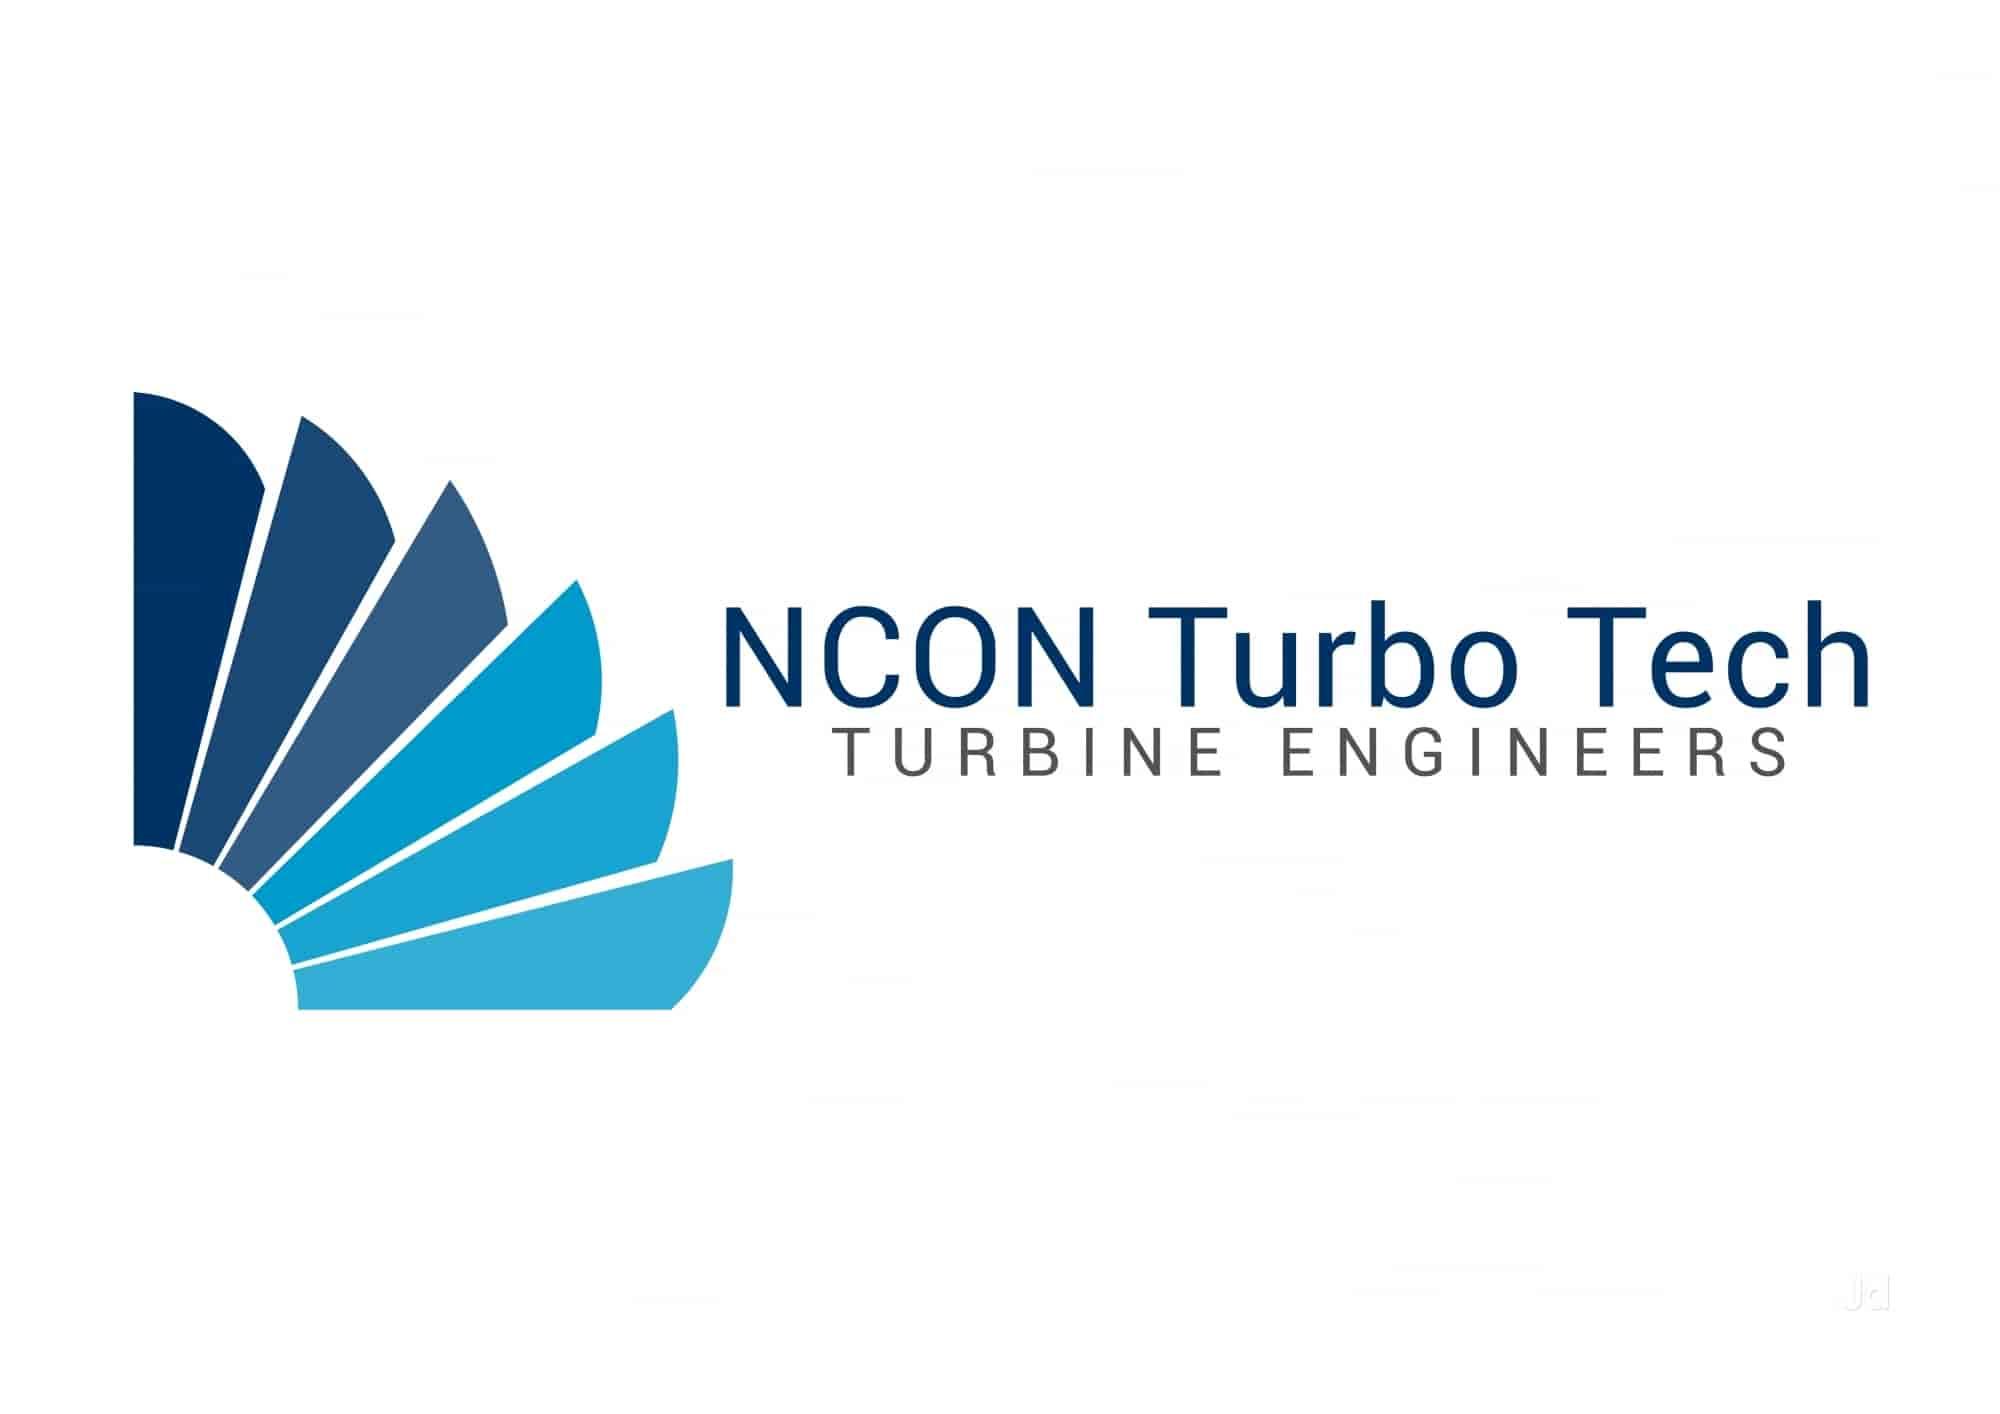 Ncon Turbo Tech PVT LTD Rajajinagar Industrial Estate Steam